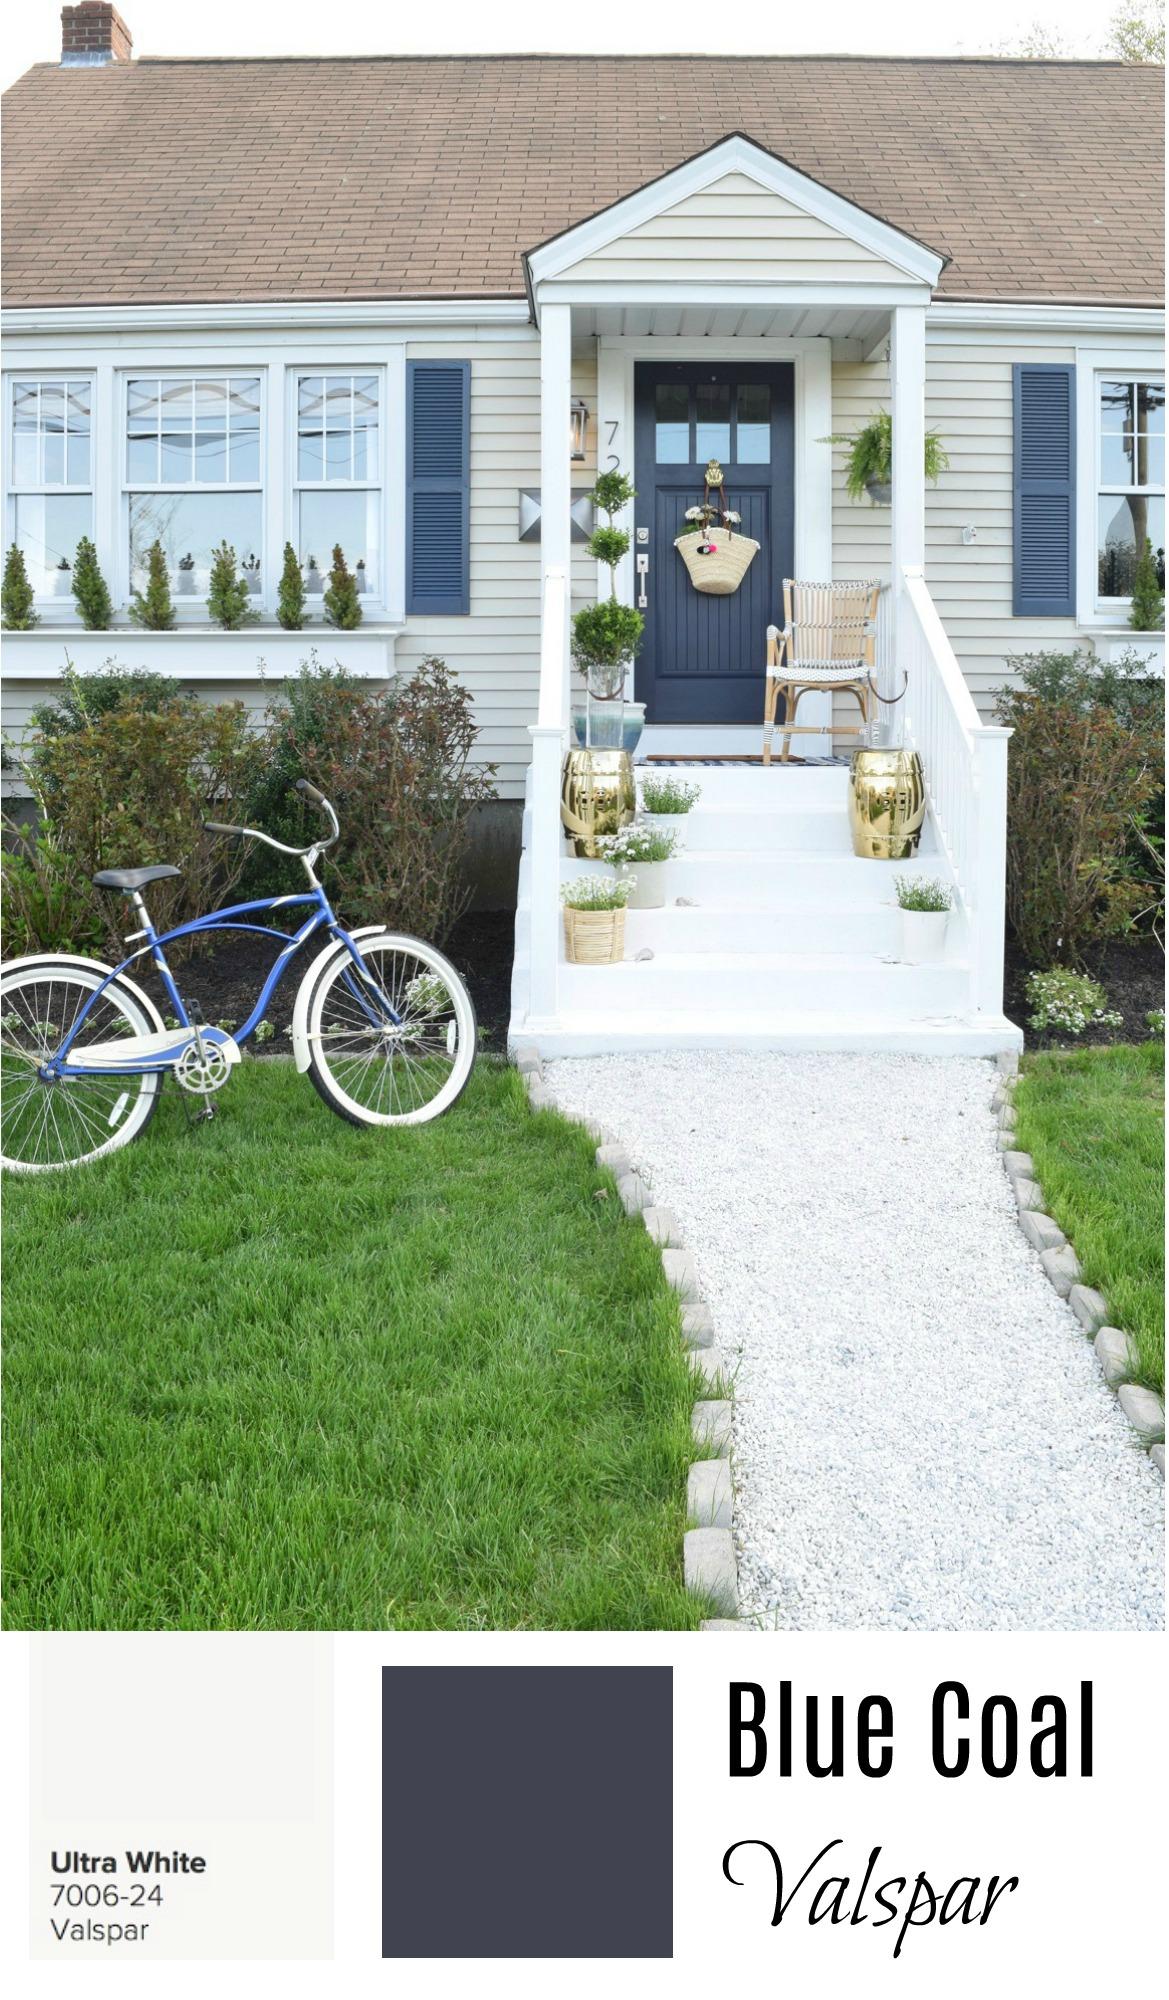 nickbarron.co] 100+ Valspar Exterior Paint Images | My Blog | Best ...